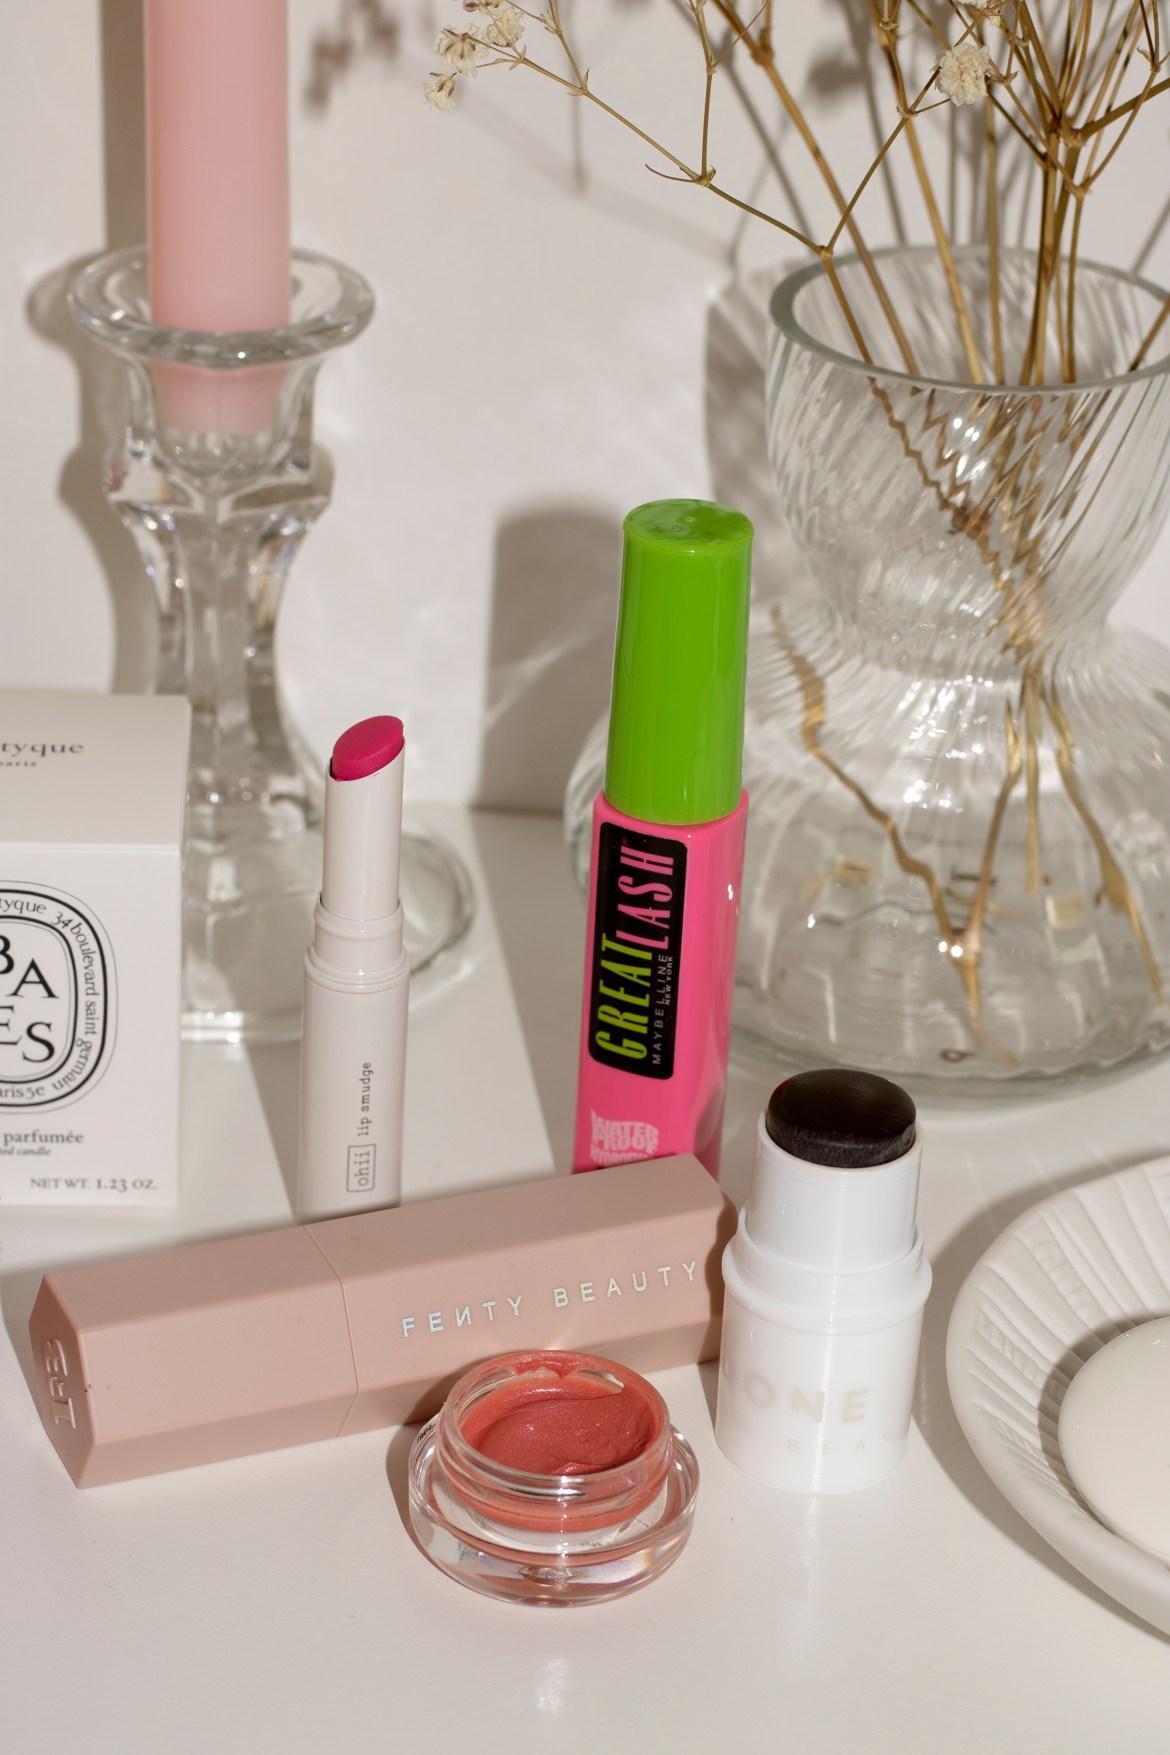 makeup vanity featuring ohii beauty, maybelline great lash, incredible cosmetics cream blush, lip smudge, bronzing gel